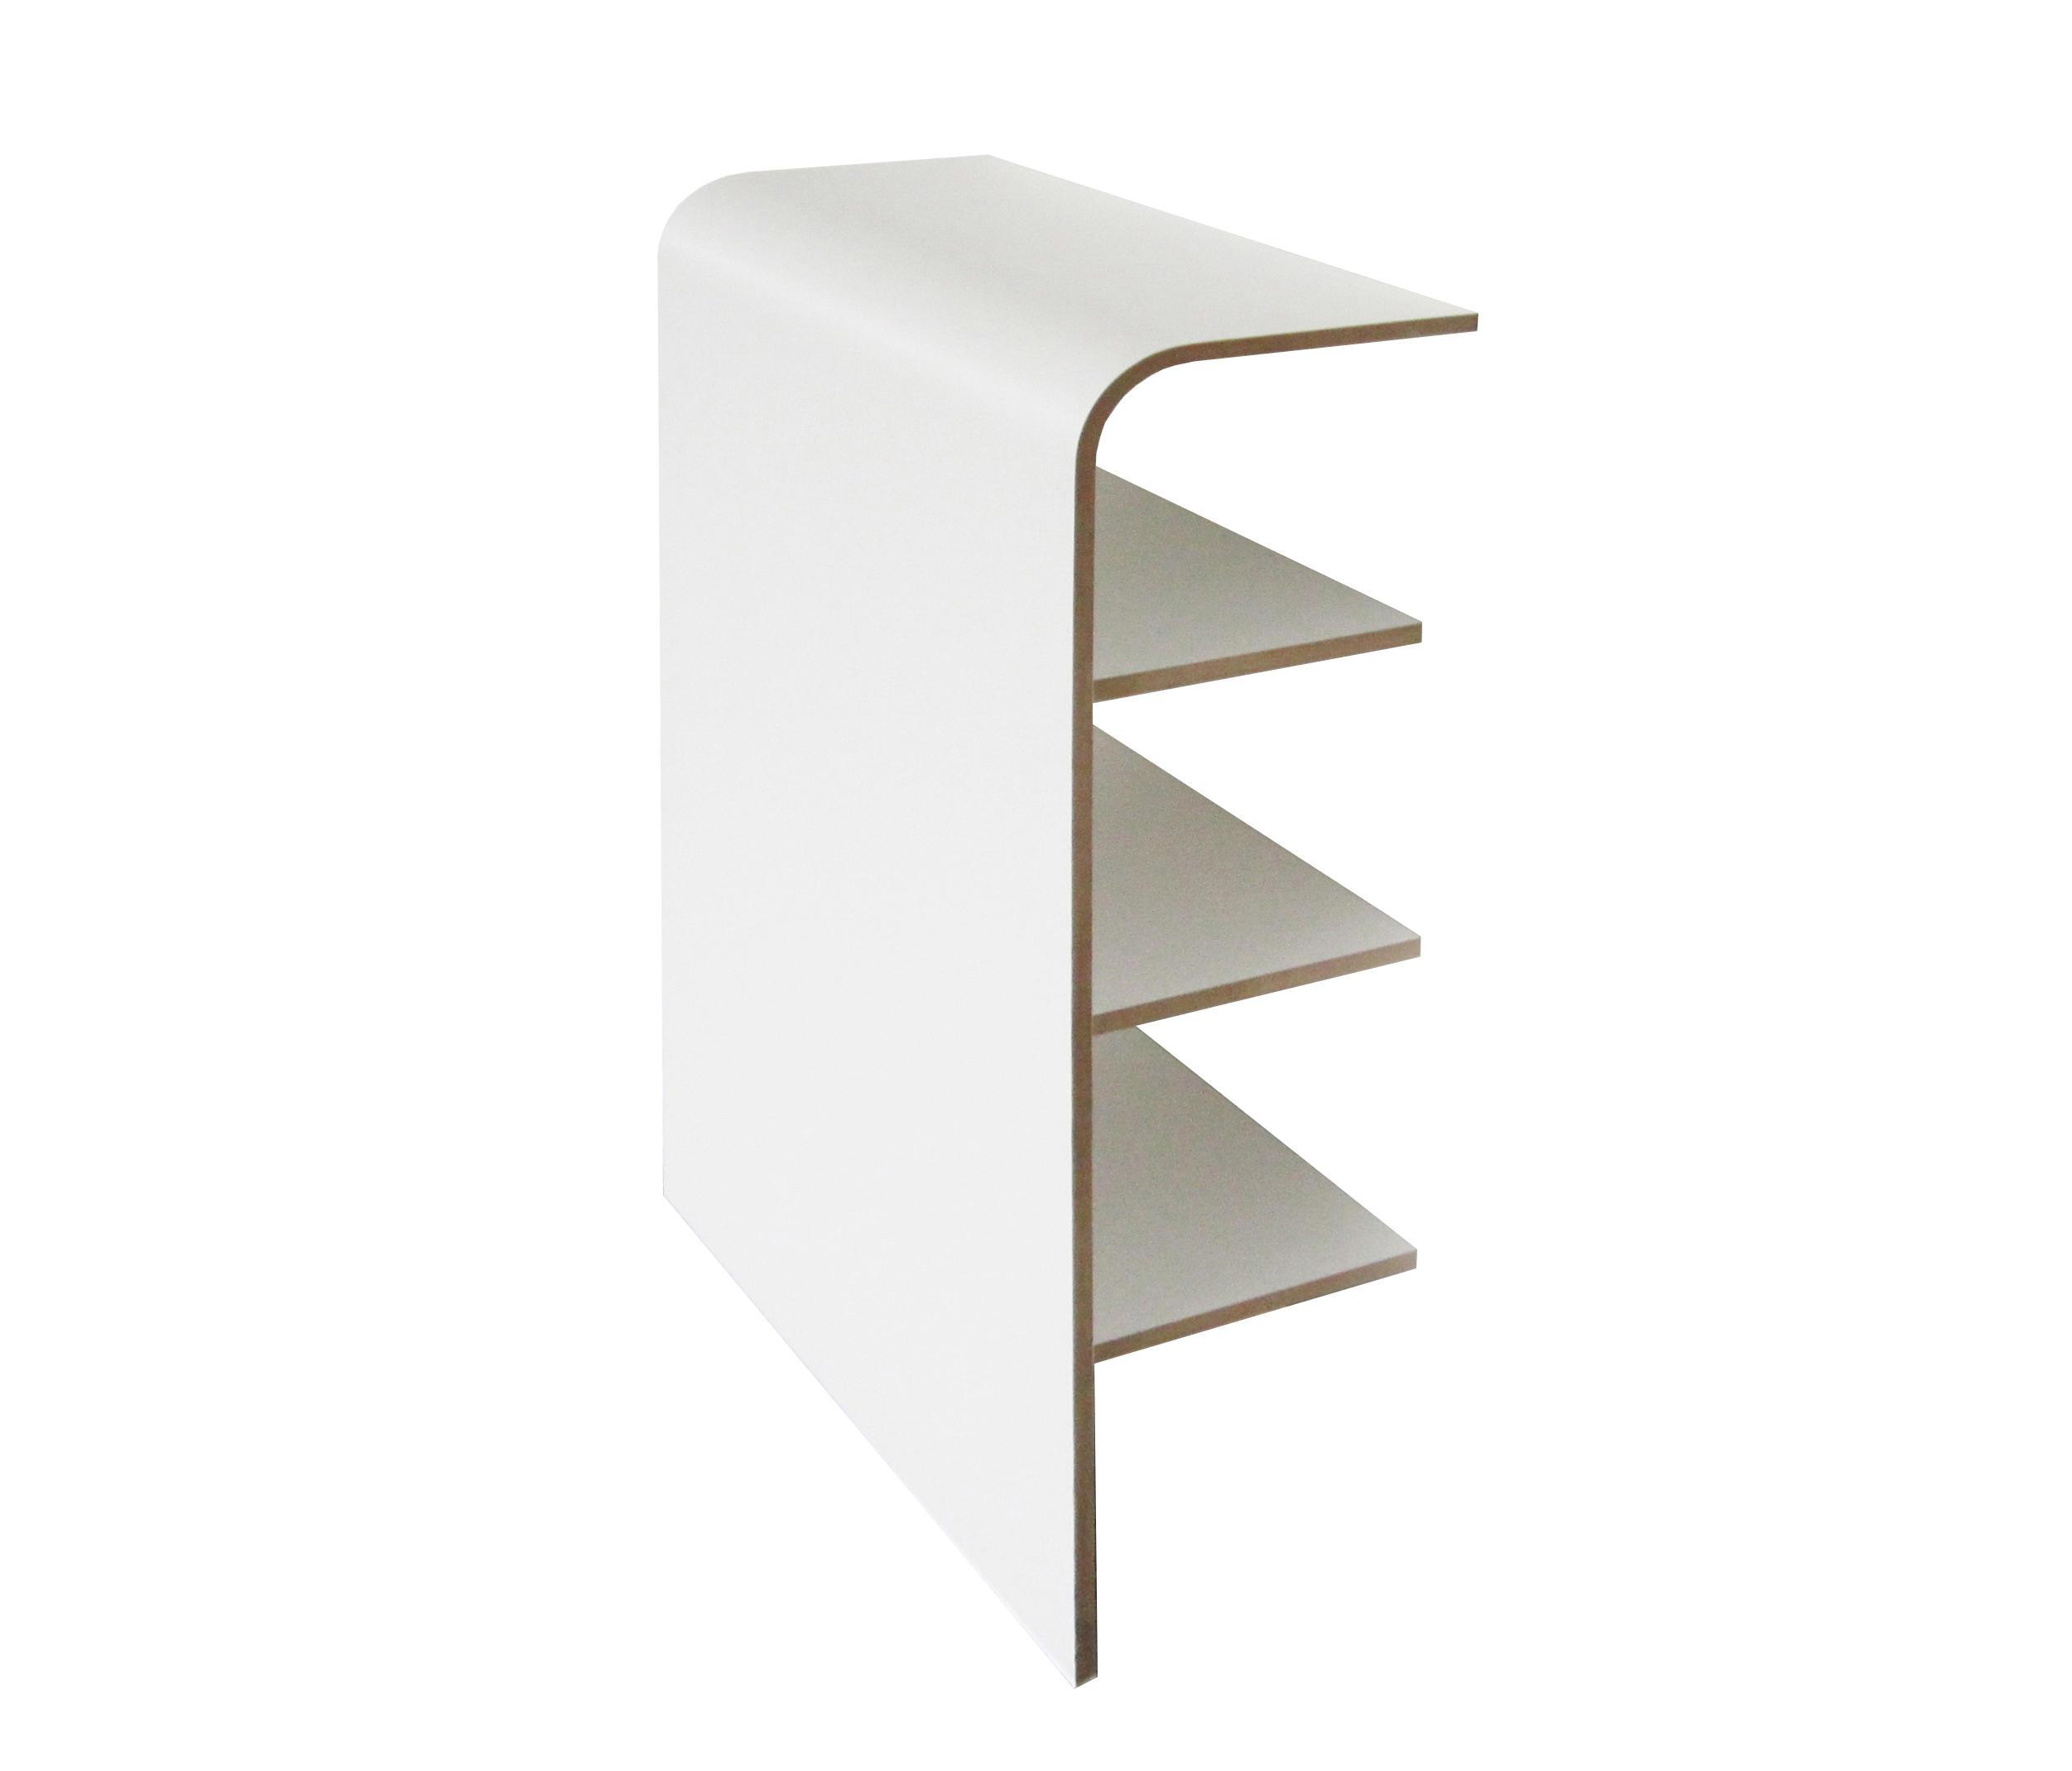 Tojo Möbel tojo platz wall shelves from tojo möbel architonic